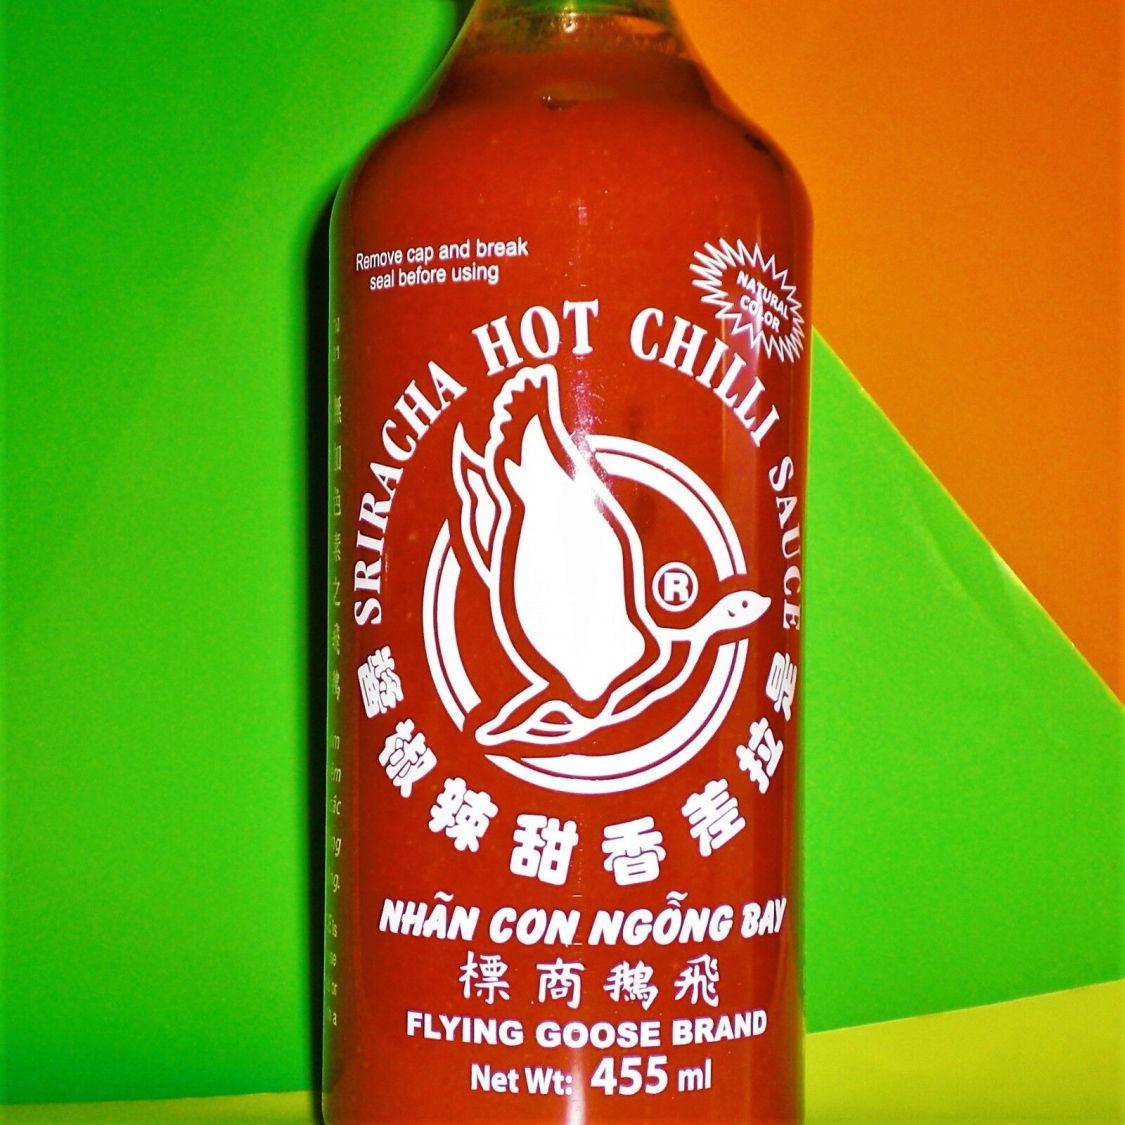 Flying Goose Hot Sriracha Chili Sauce 455ml Scharf Kebab €0.88/100ml